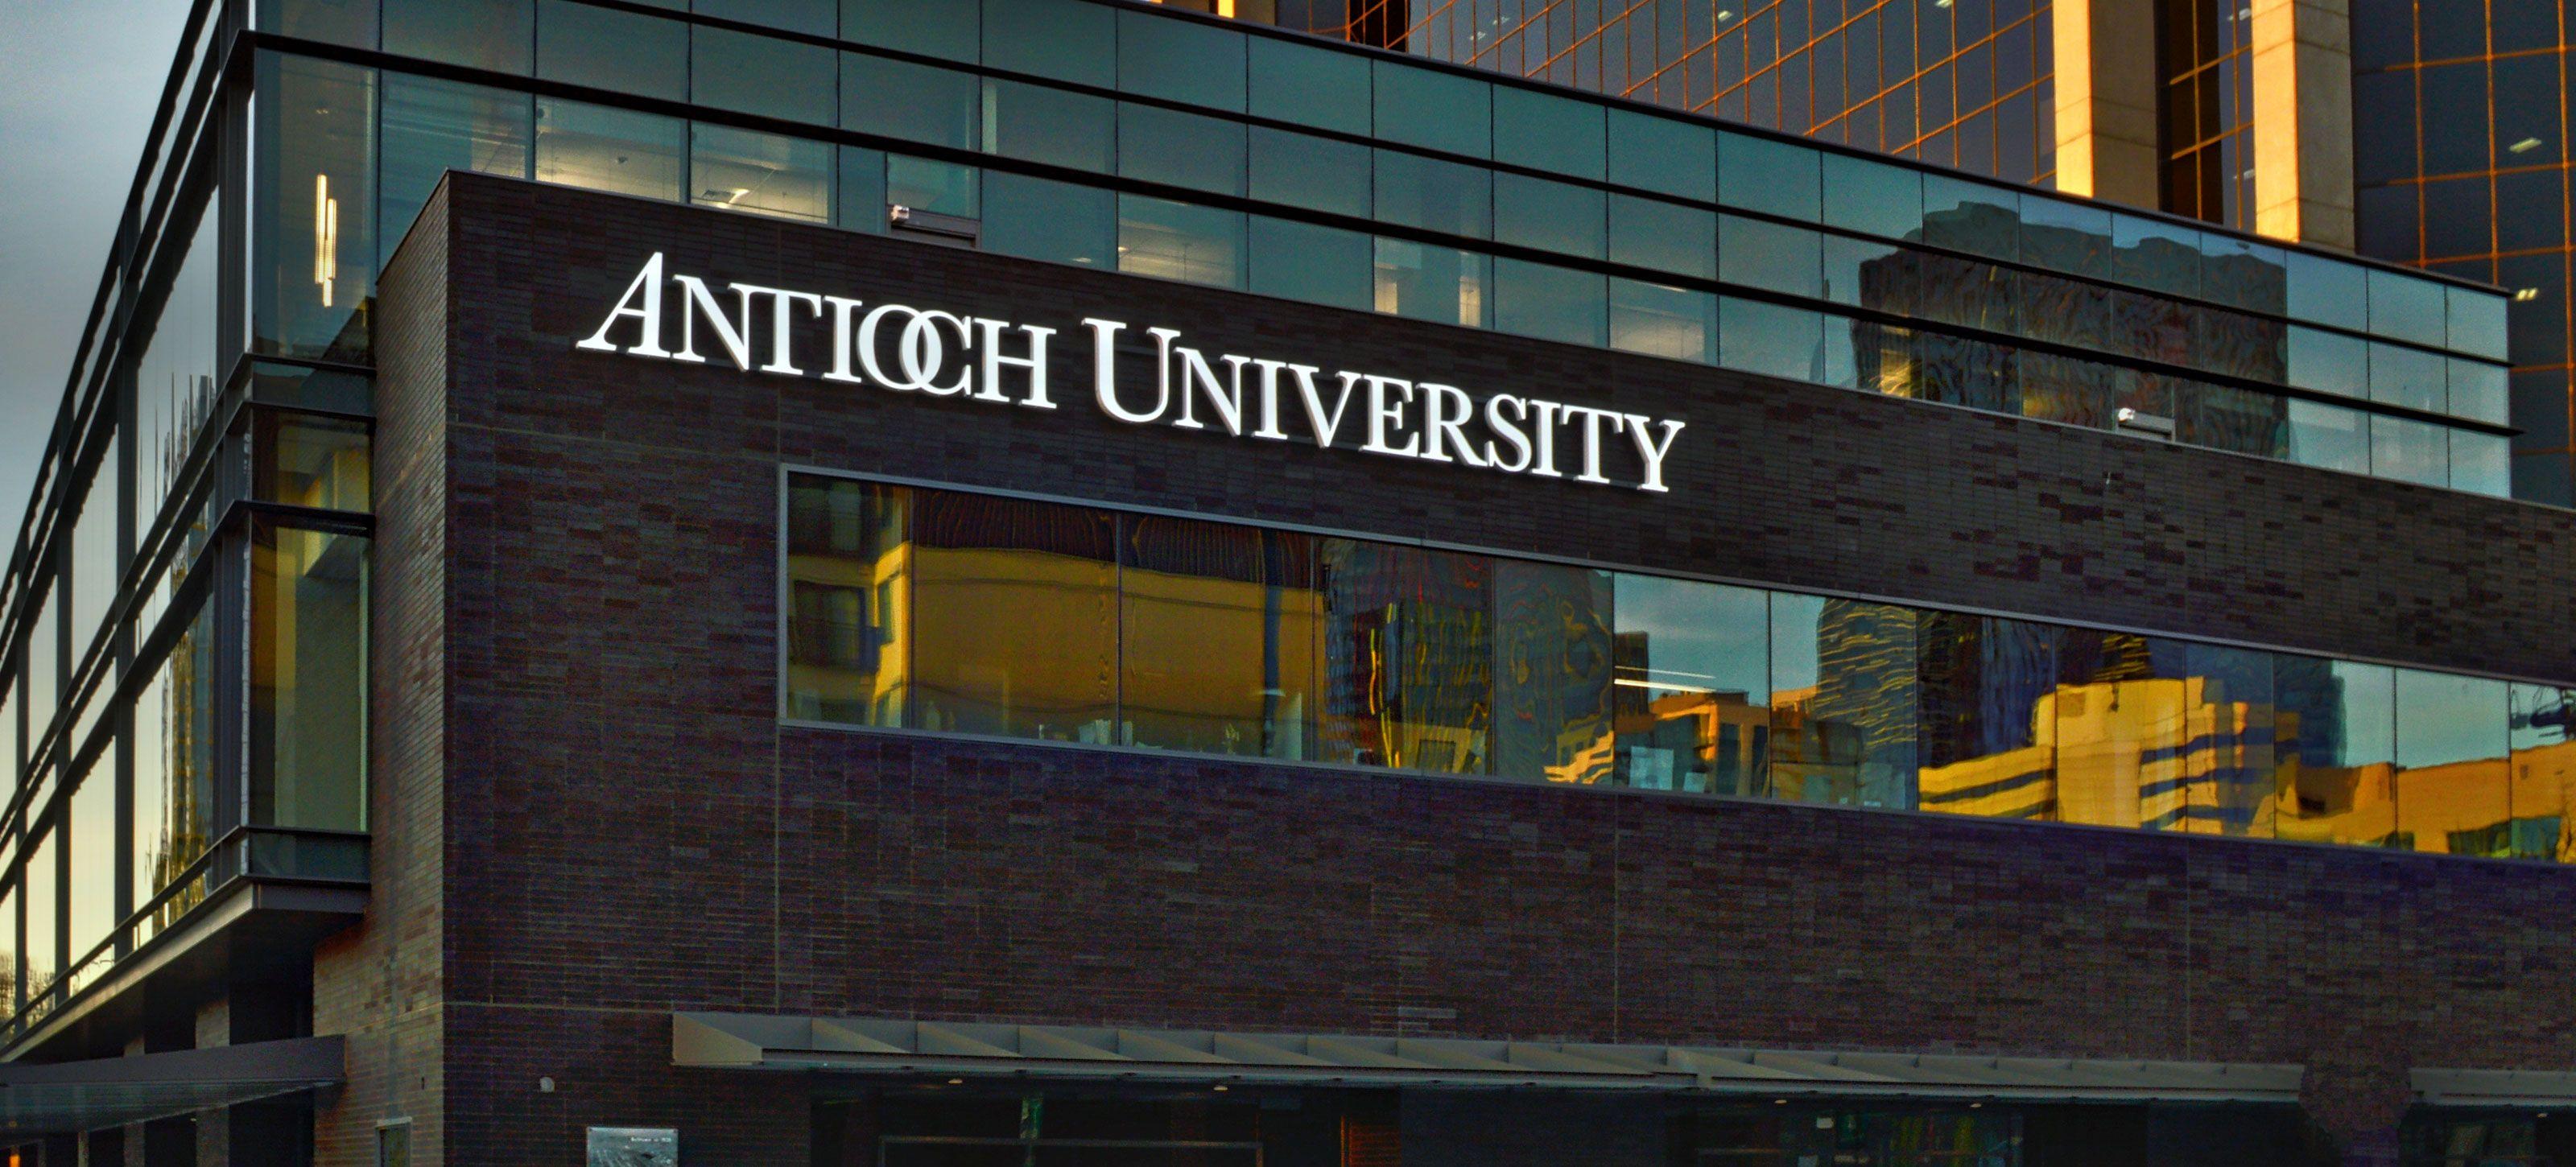 Antioch University provides experiential & socially